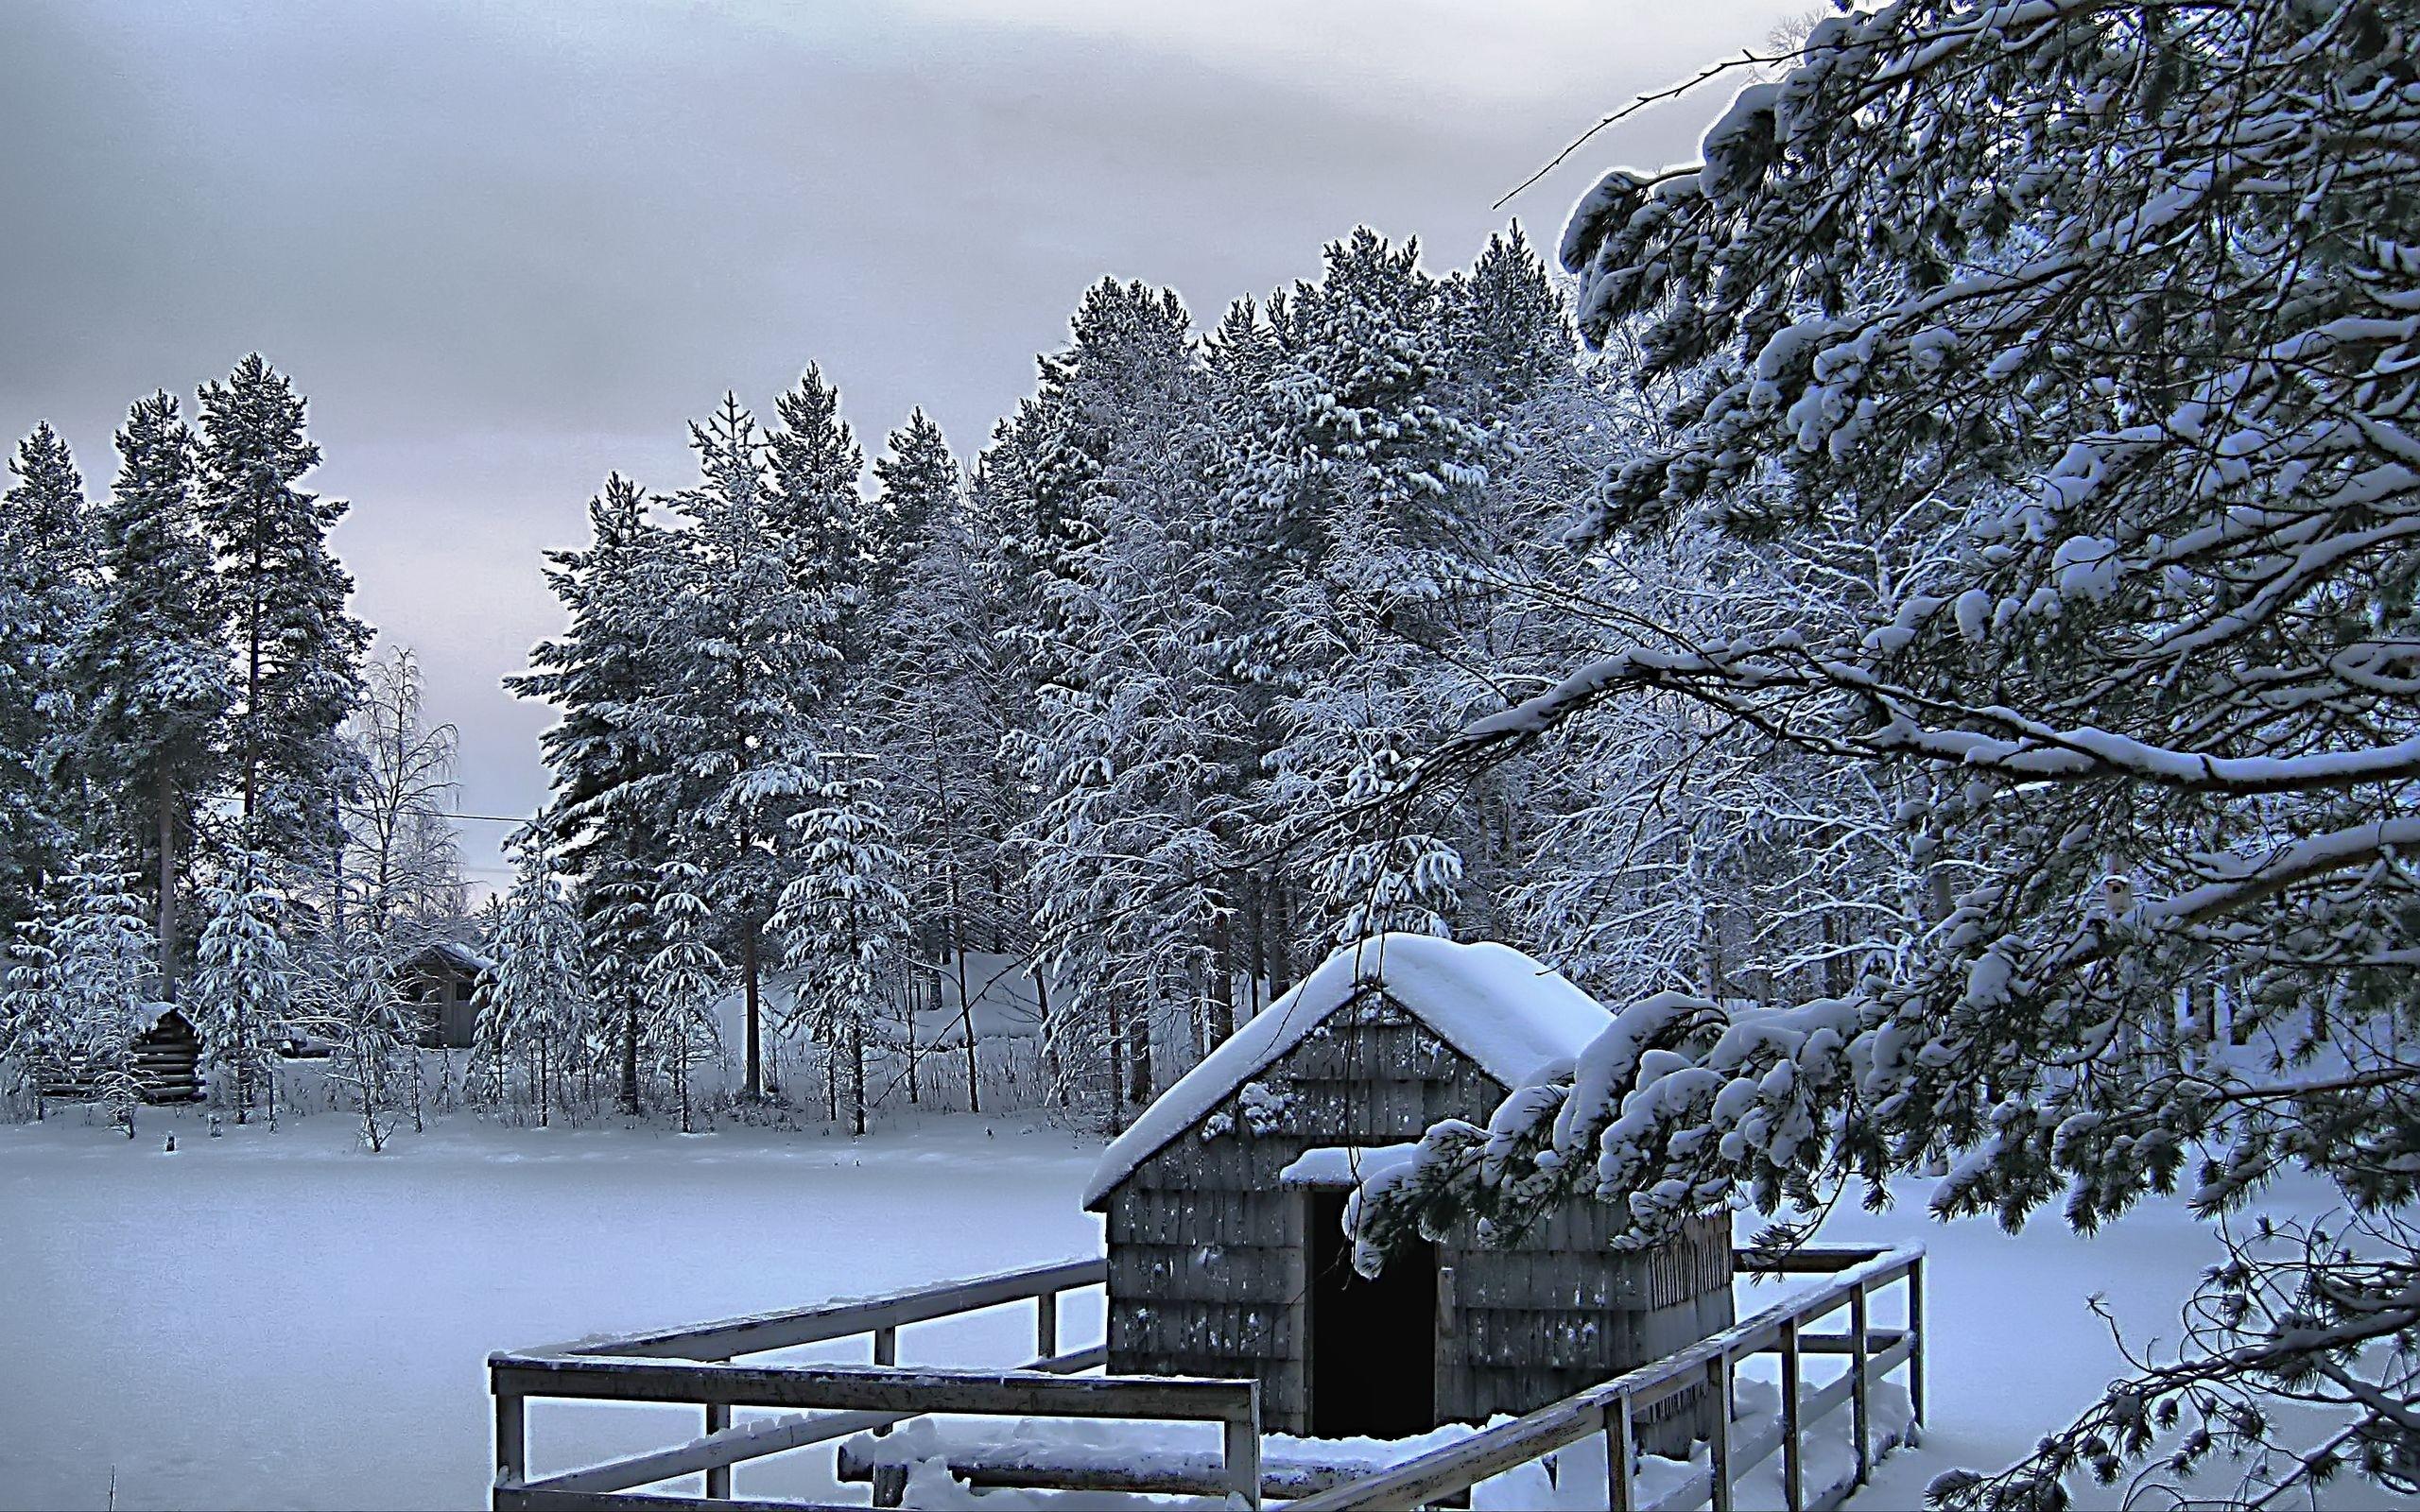 scenic winter beautiful wallpapers - photo #15